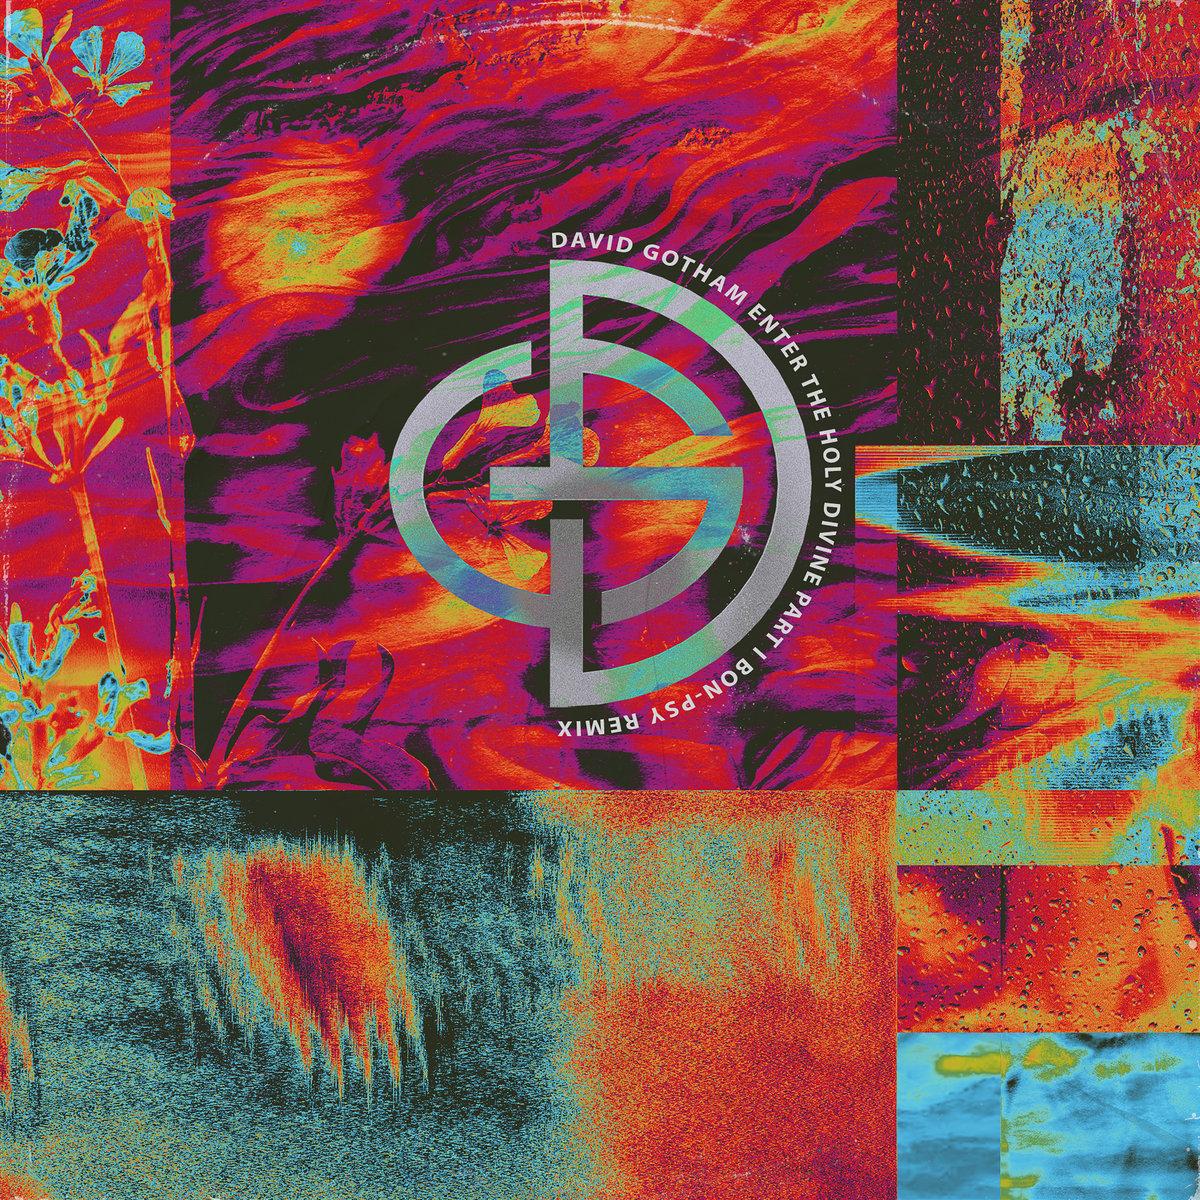 David Gotham, Bon-Psy – Enter, The Holy Divine (Part I) (Bon-Psy Remix)